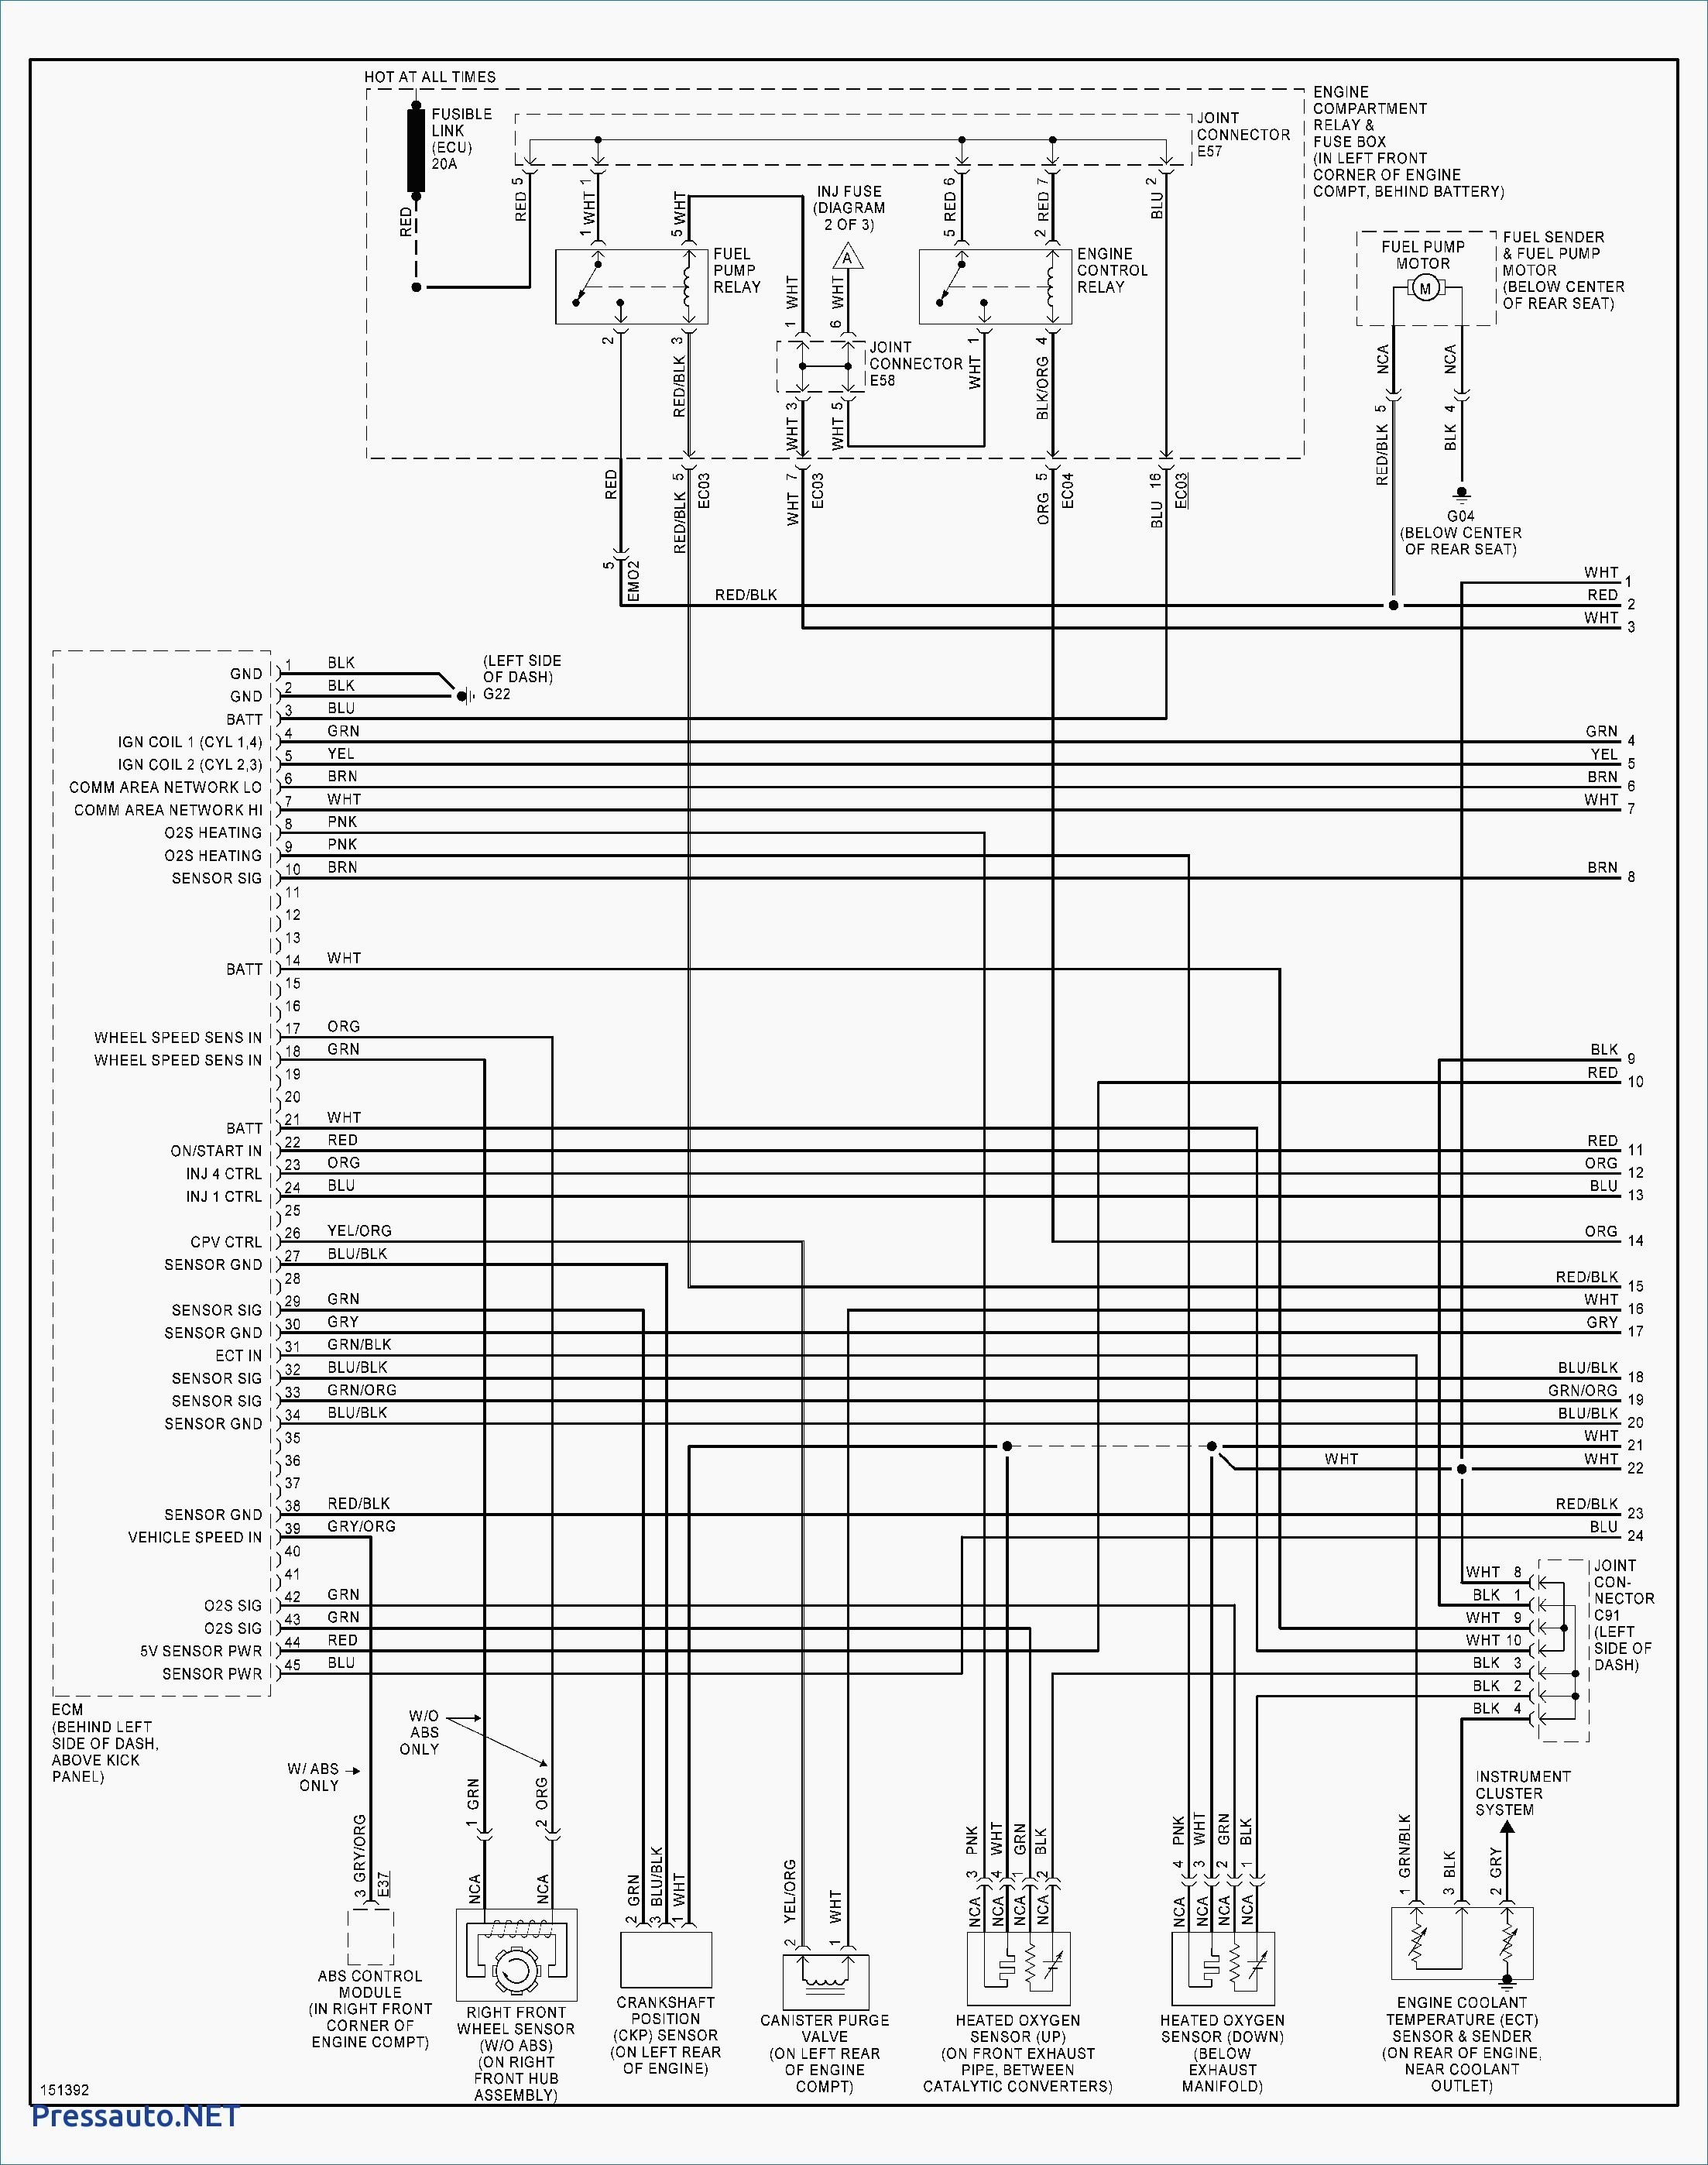 2011 Hyundai Elantra Engine Diagram Hyundai Accent Engine Diagram In Addition 2005 Hyundai